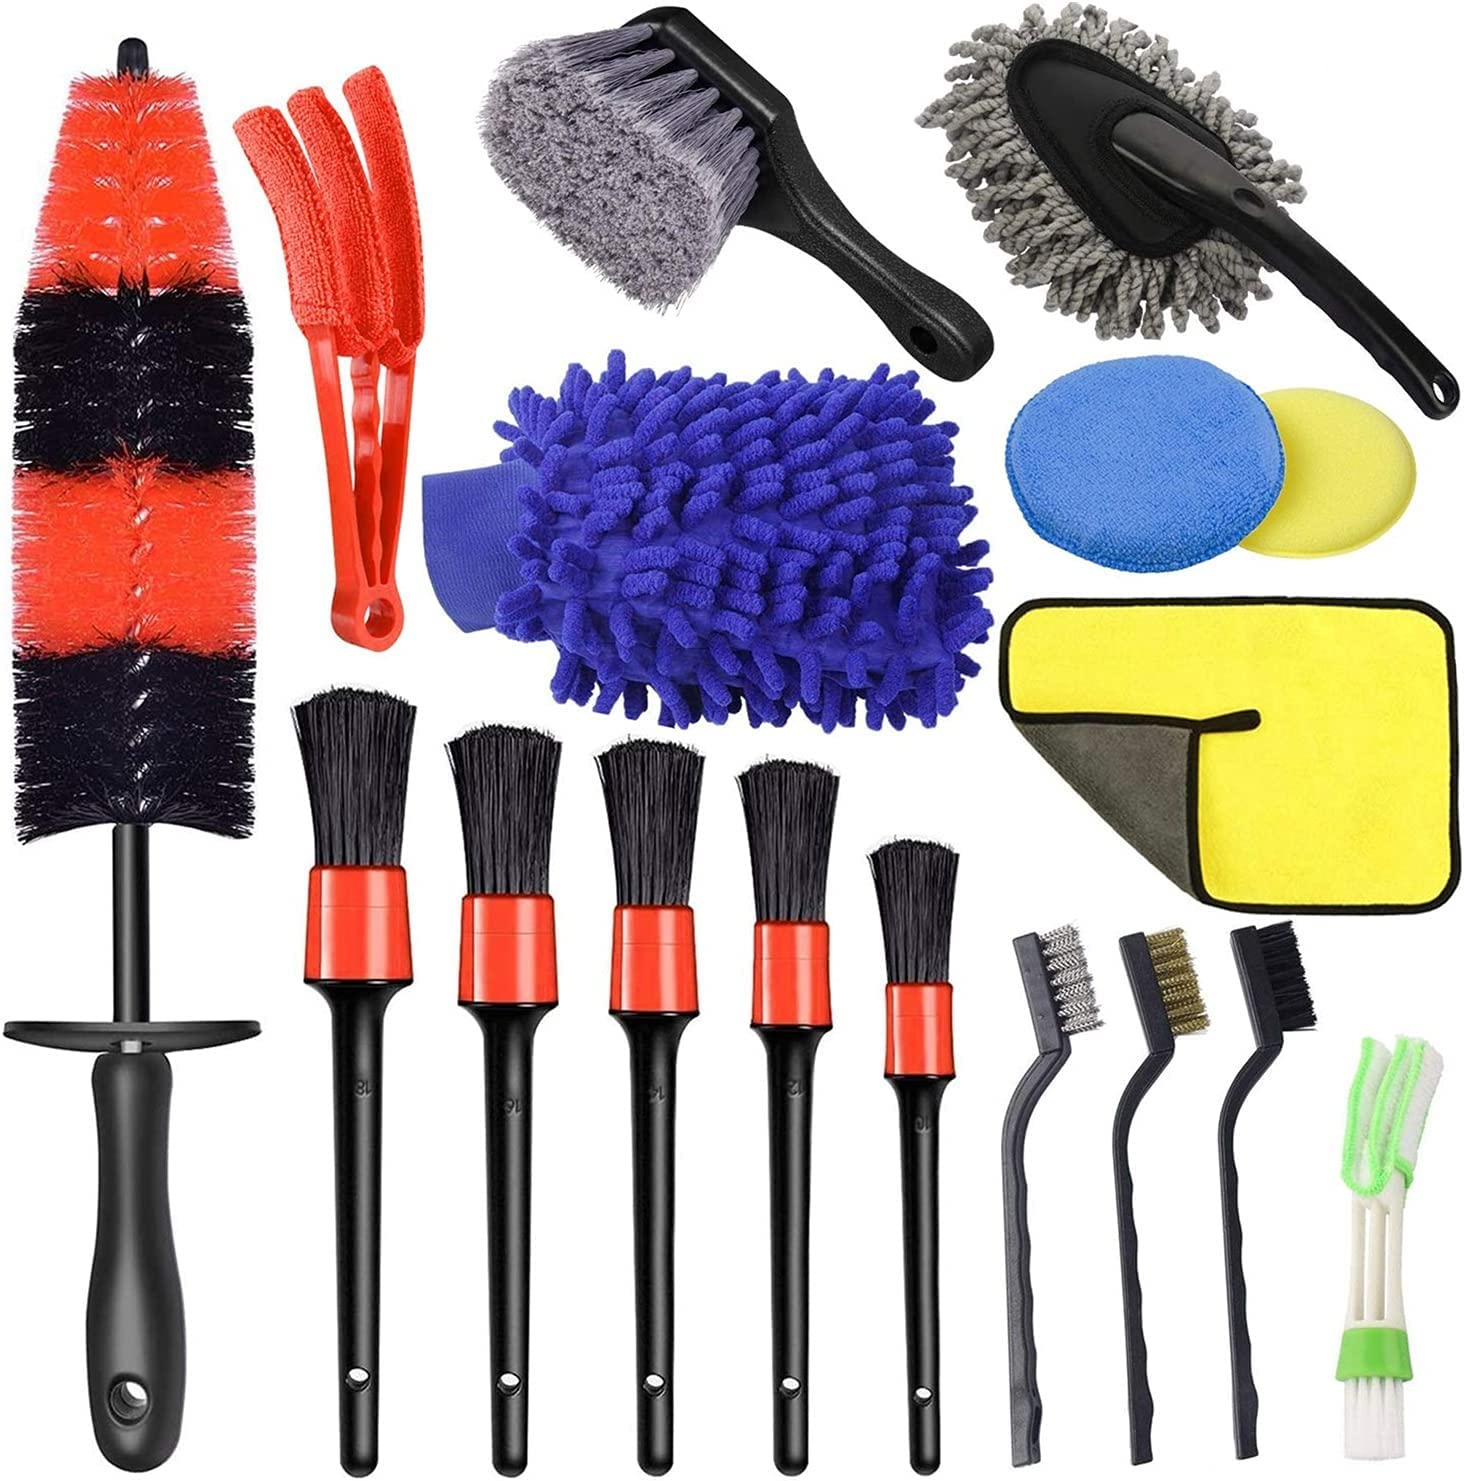 YXIUER 17 Pcs Store Car Wheel Brush Kit Lo Set 13.5inch Superior Detailing